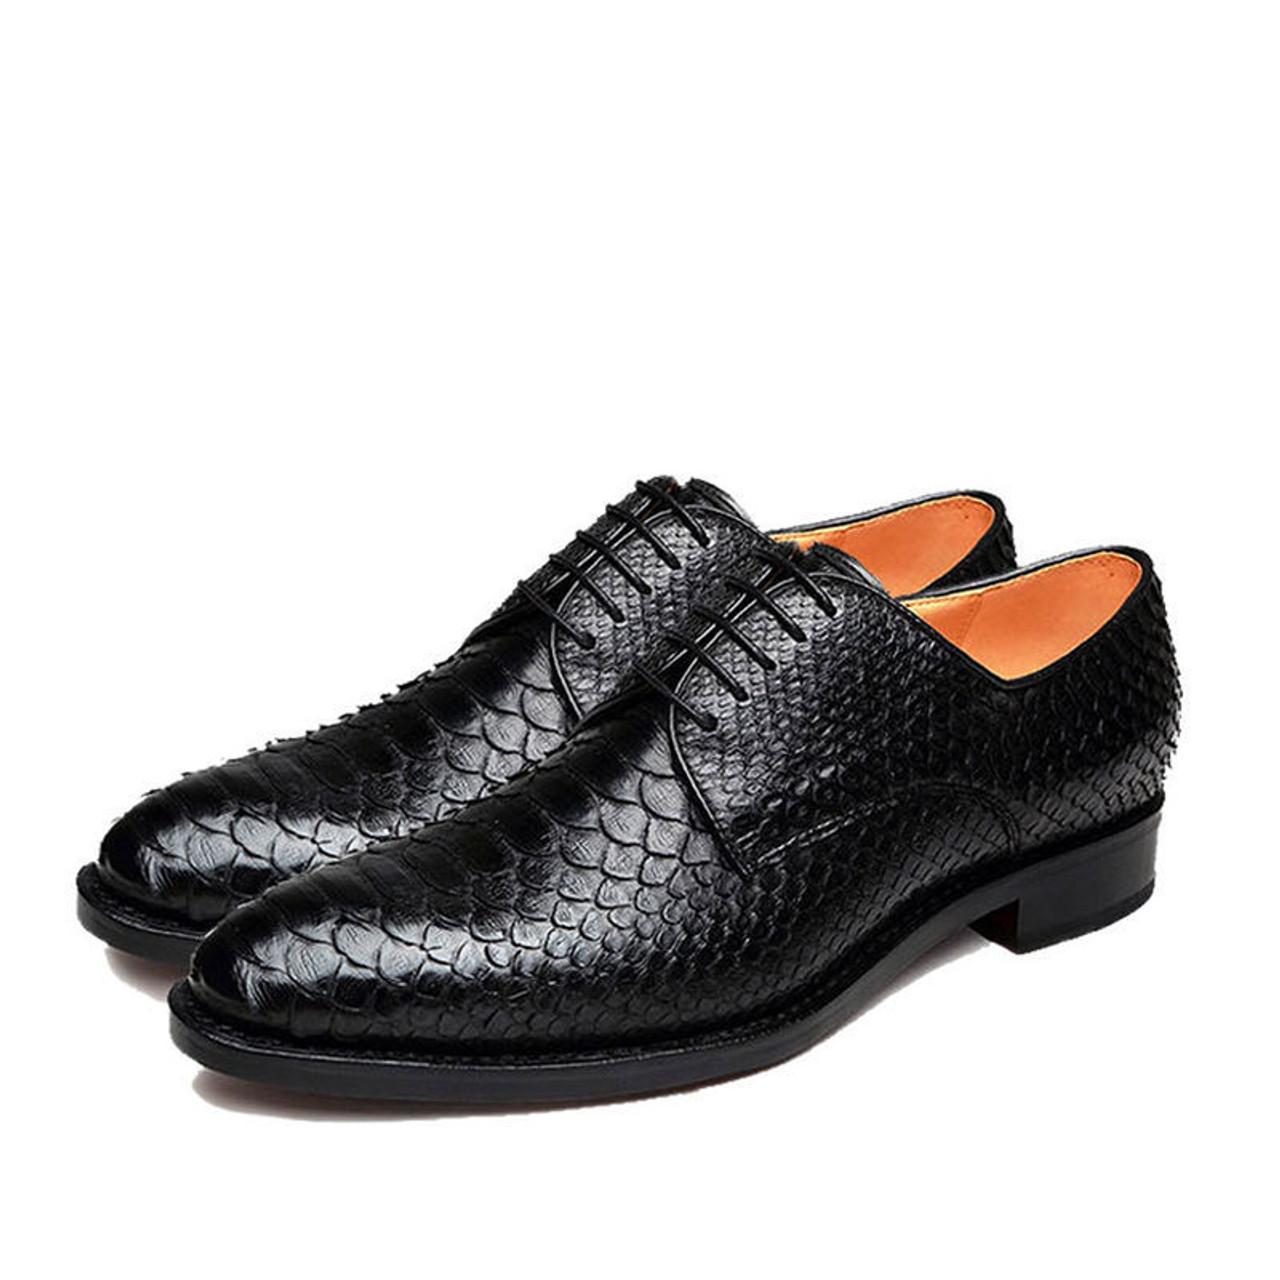 Snakeskin Shoes|Black Leather Shoes Mens